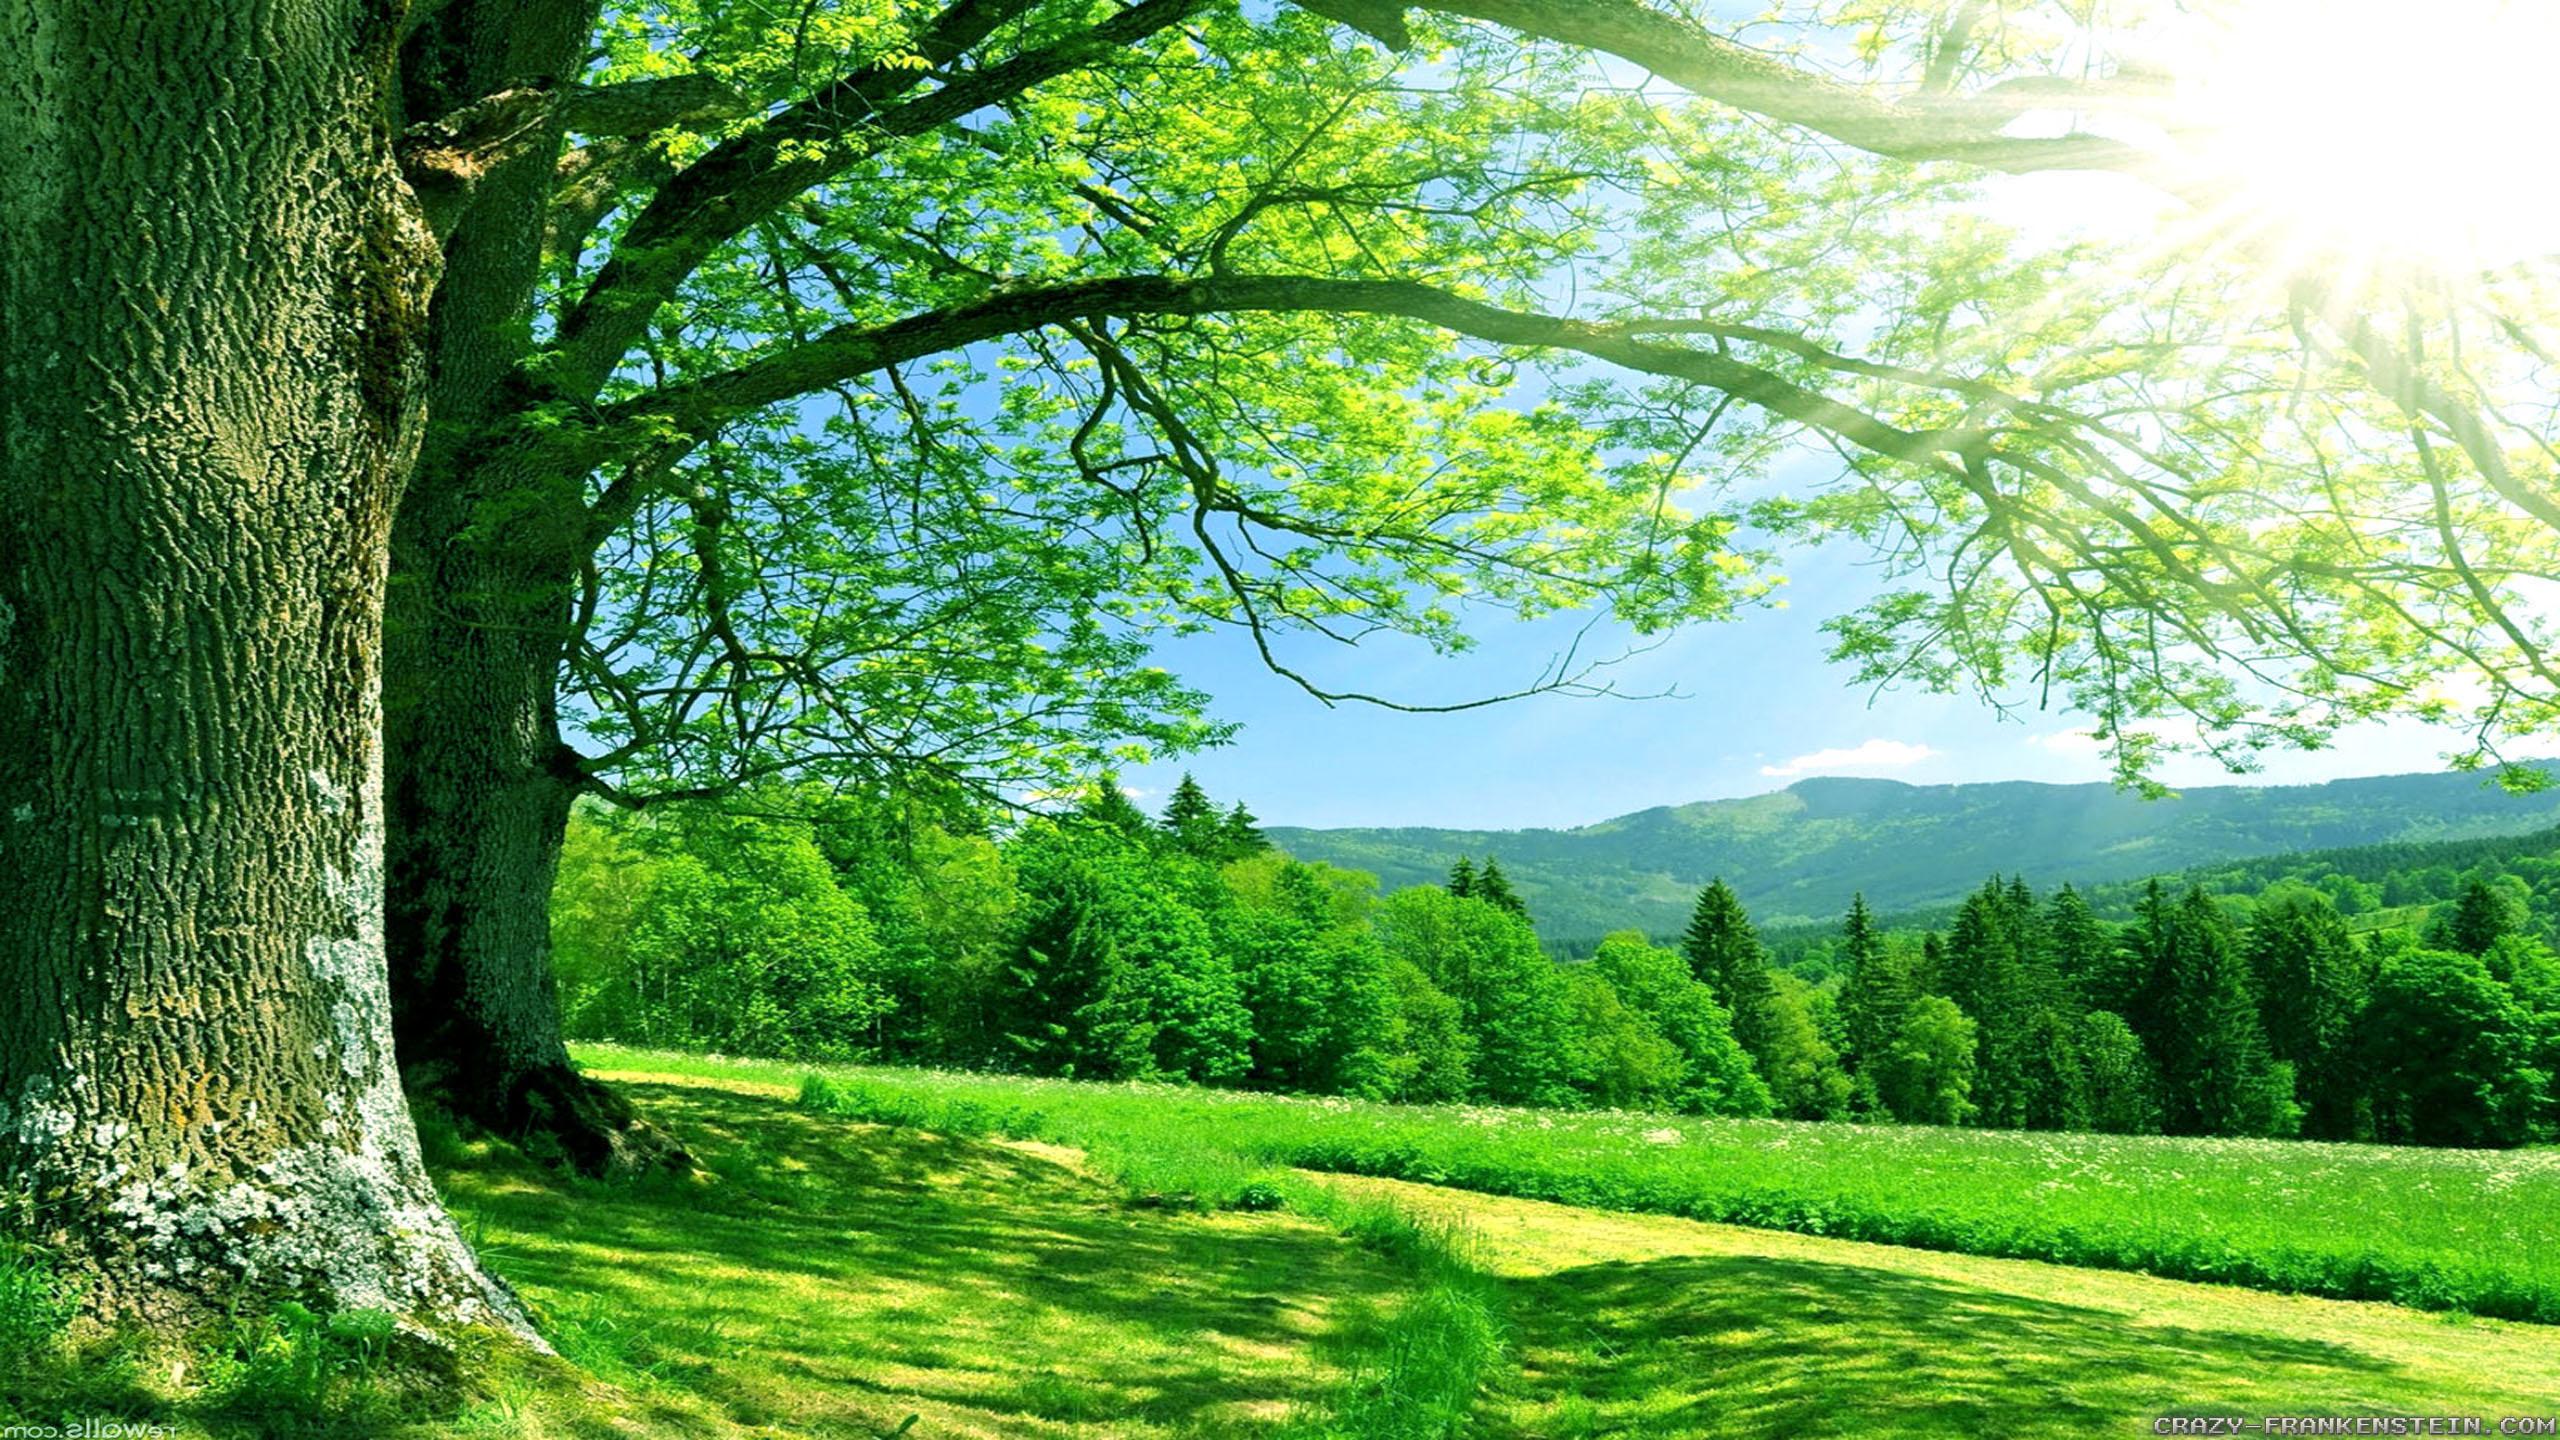 greennature.jpg